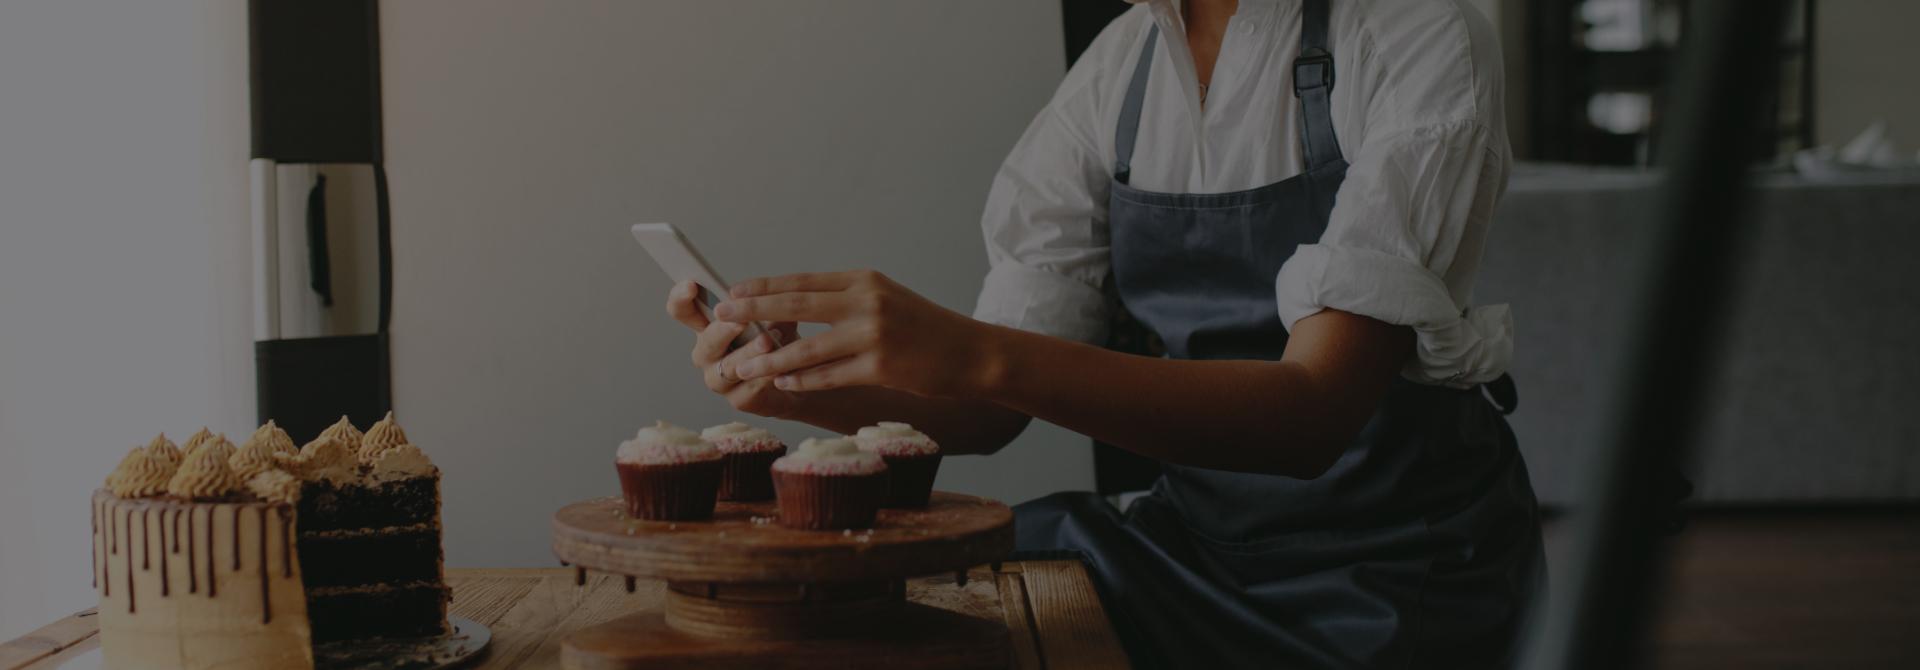 Kitchen Innovation Award 2021